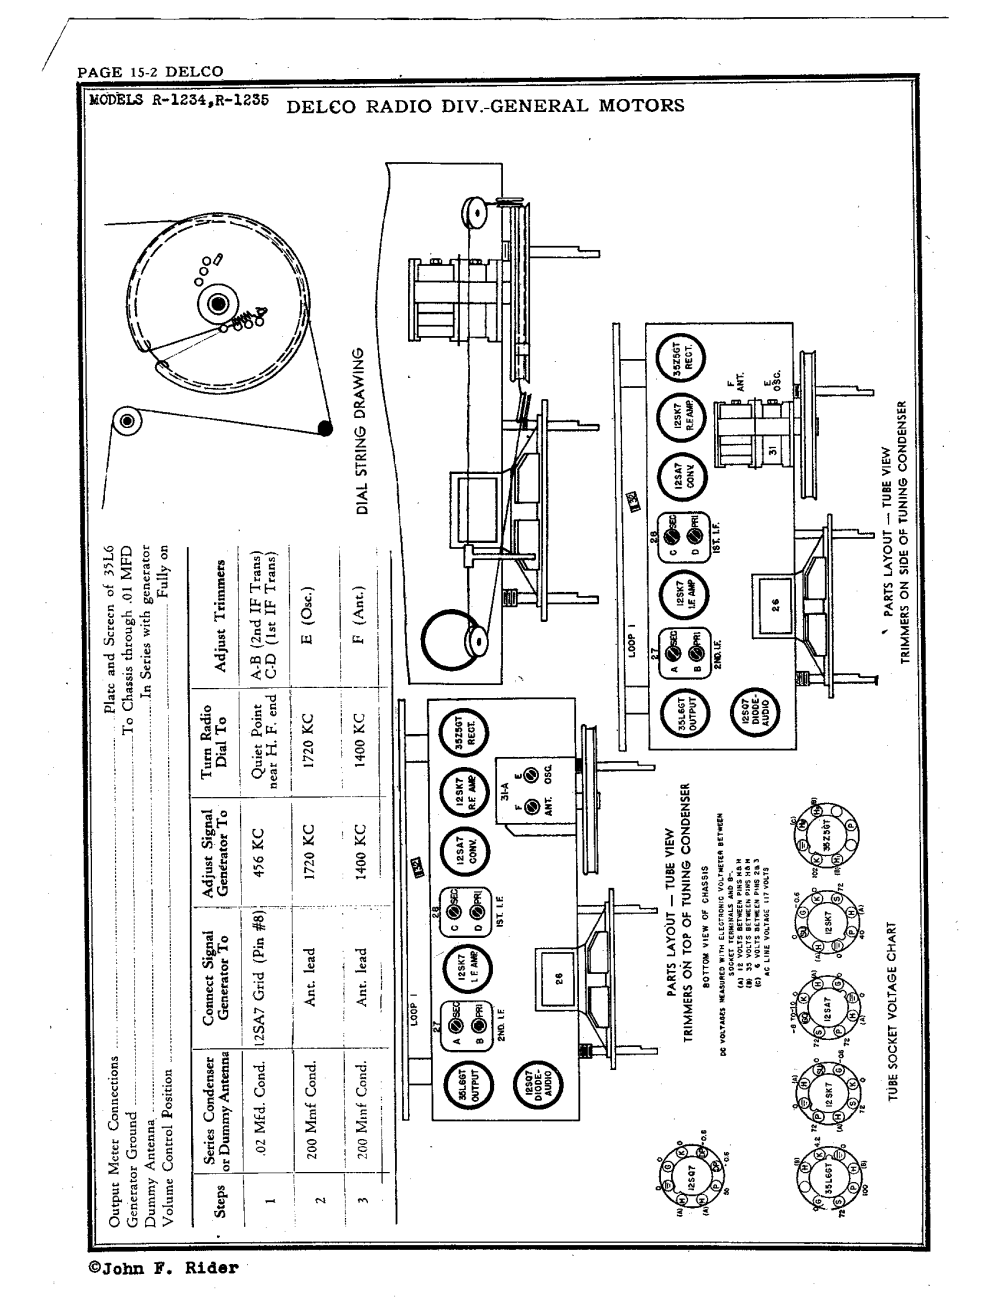 medium resolution of delco radio schematics wiring diagram hostdelco radio schematics wiring diagram home delco car radio schematics delco